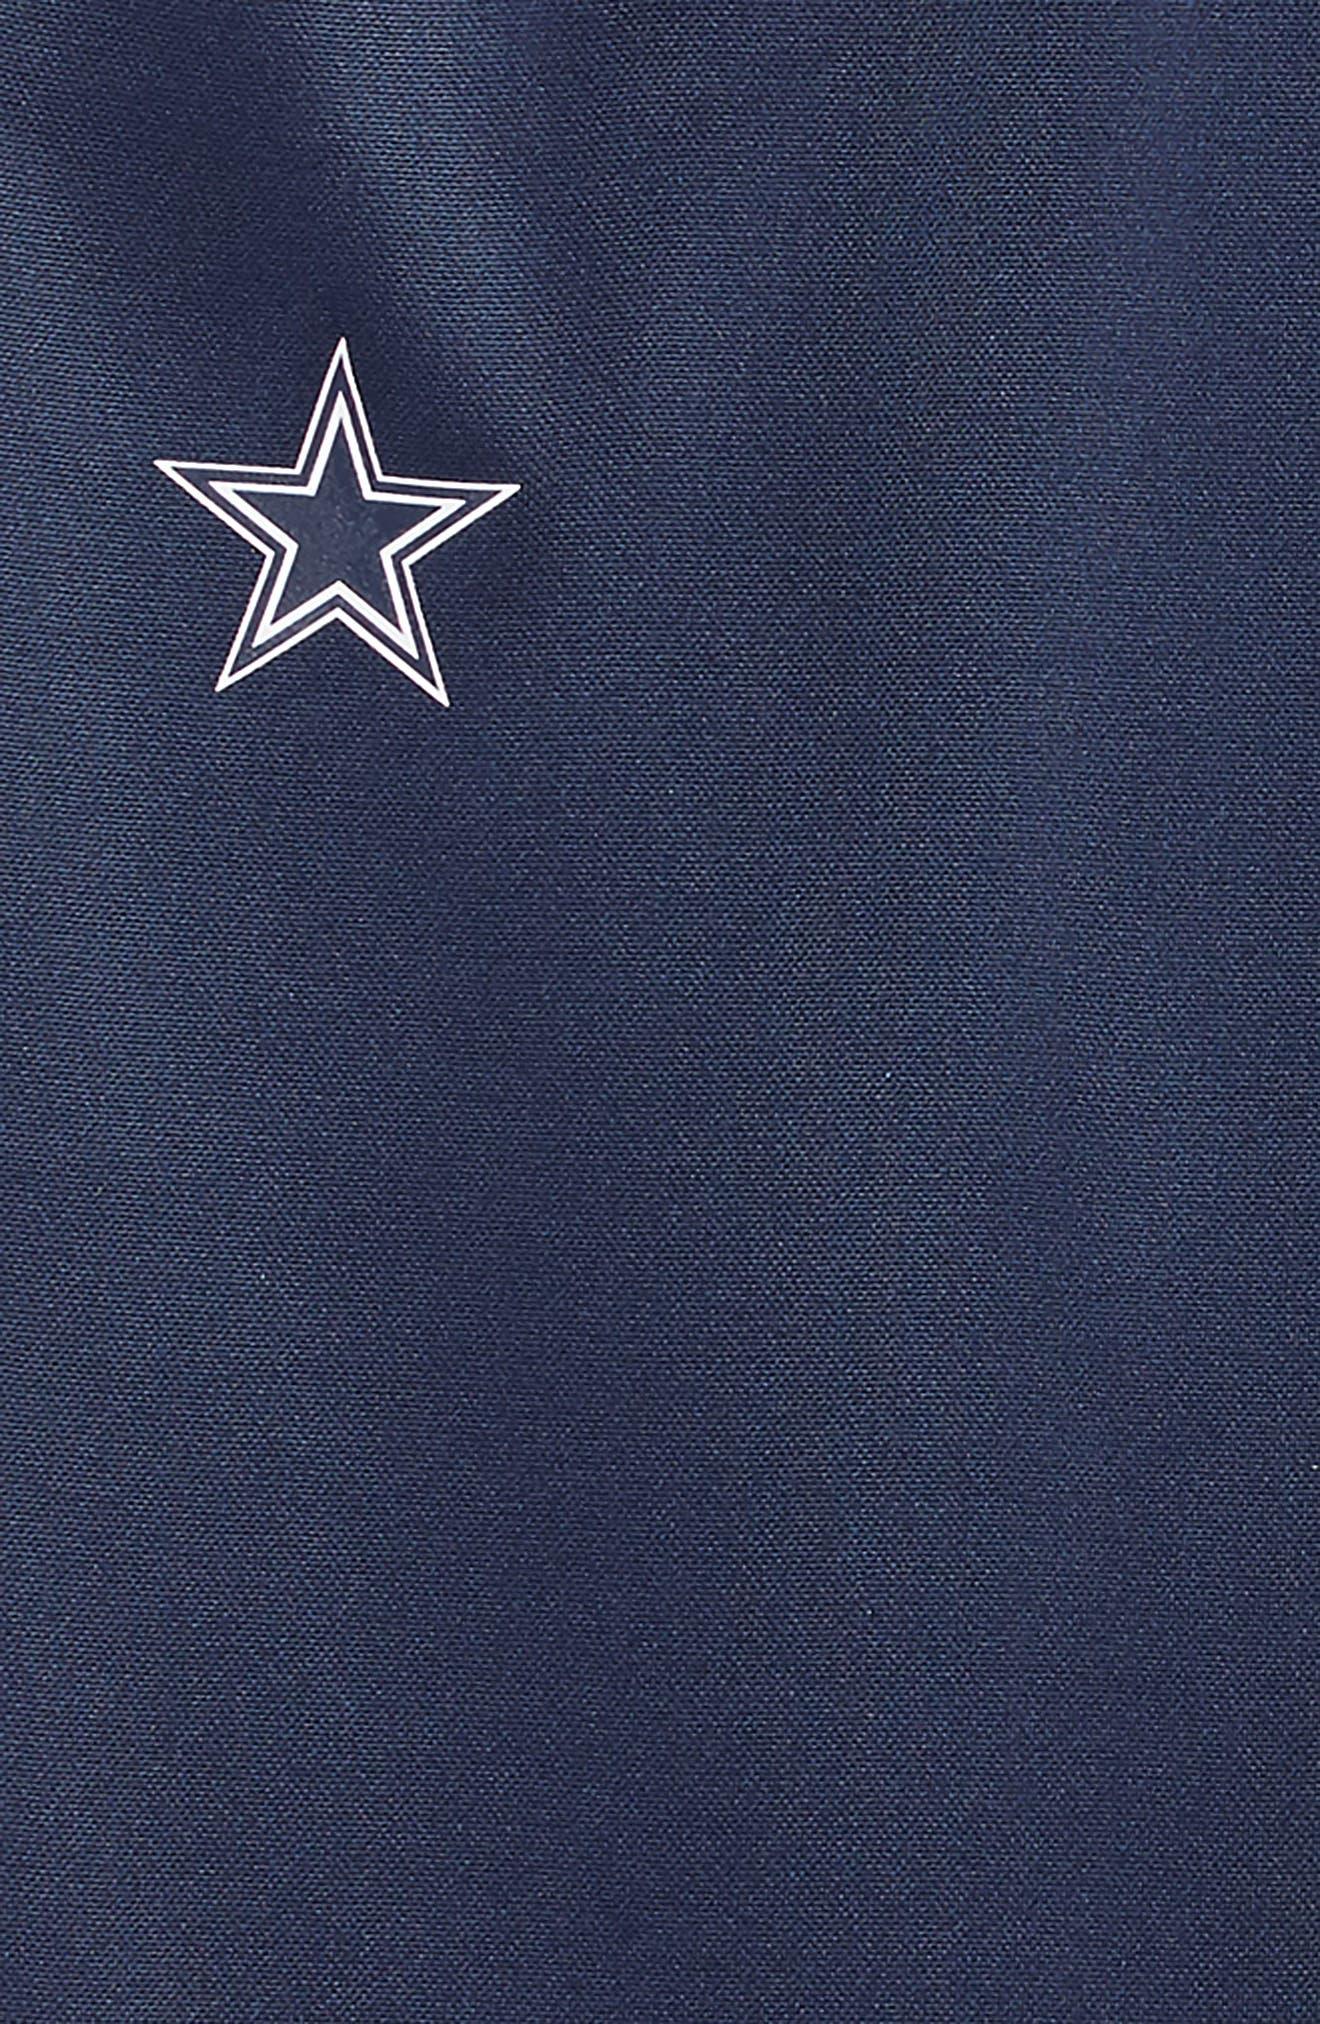 Nike NFL Dallas Cowboys Therma-FIT Pants,                             Alternate thumbnail 2, color,                             410